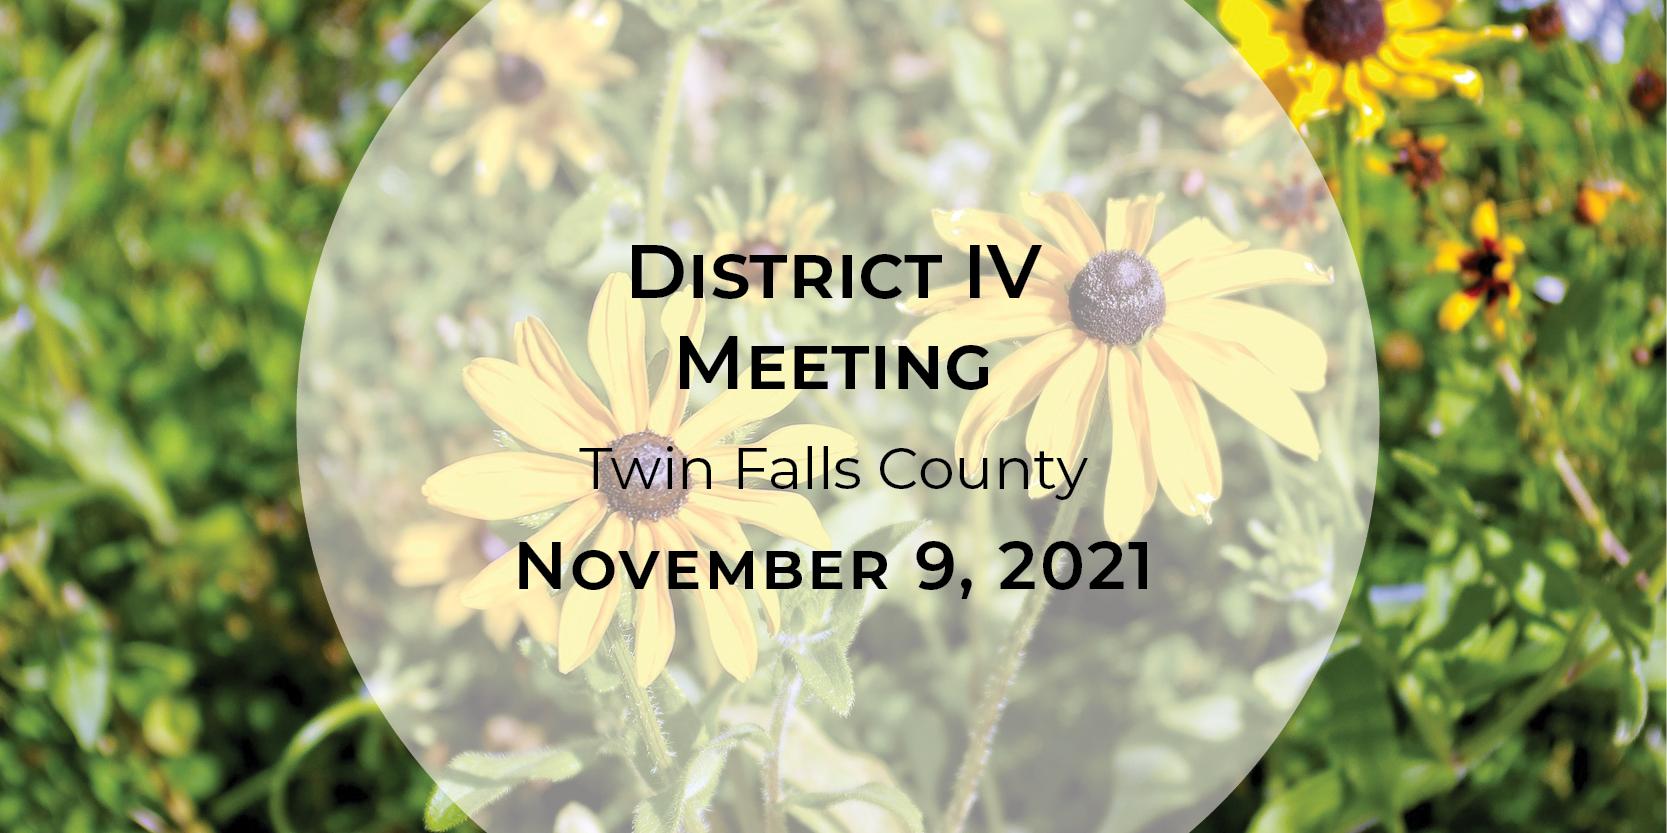 District IV Meeting